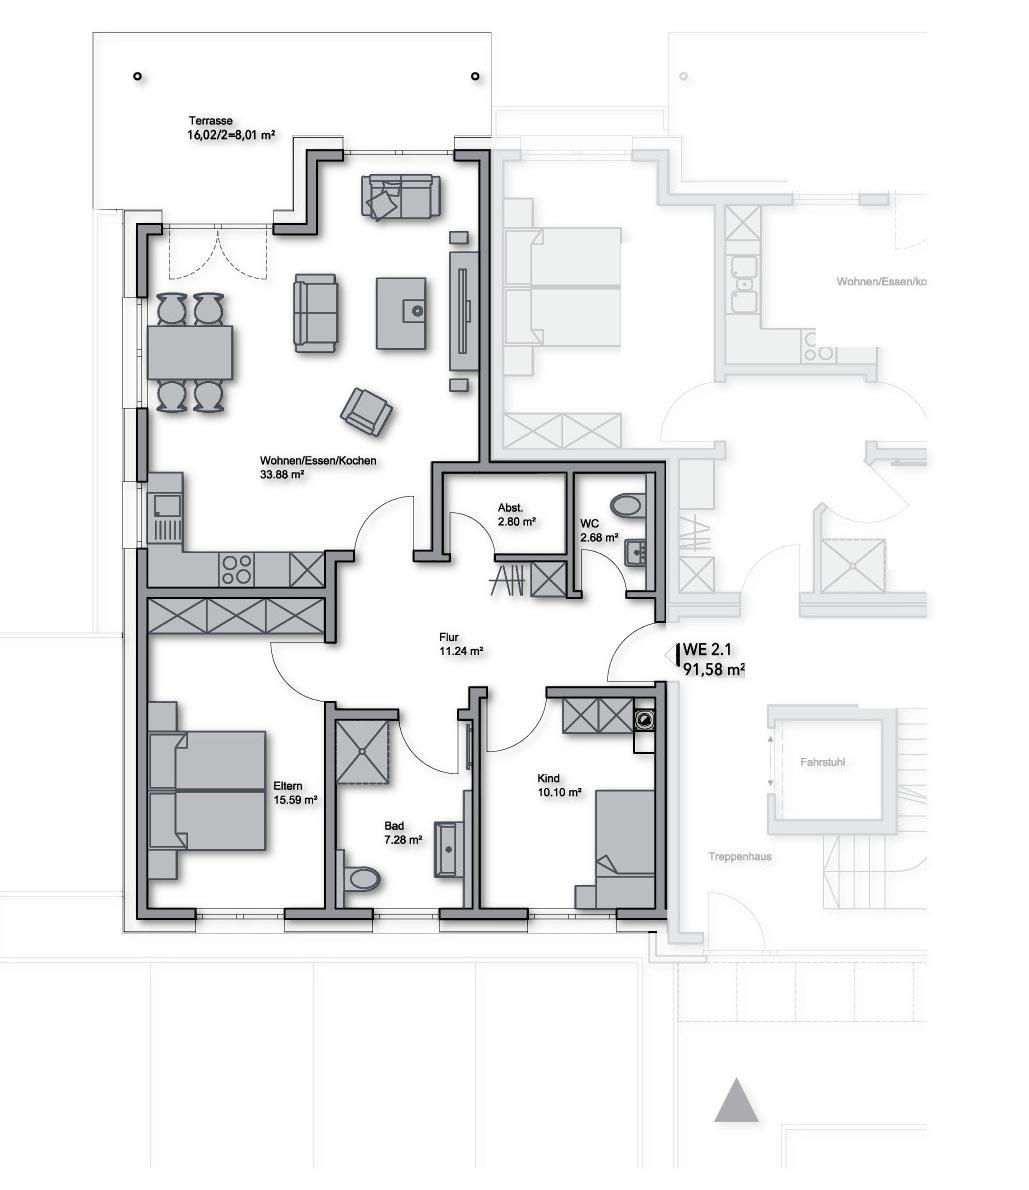 ETW-Nr. 2.1 - EG links - 91,58 m²